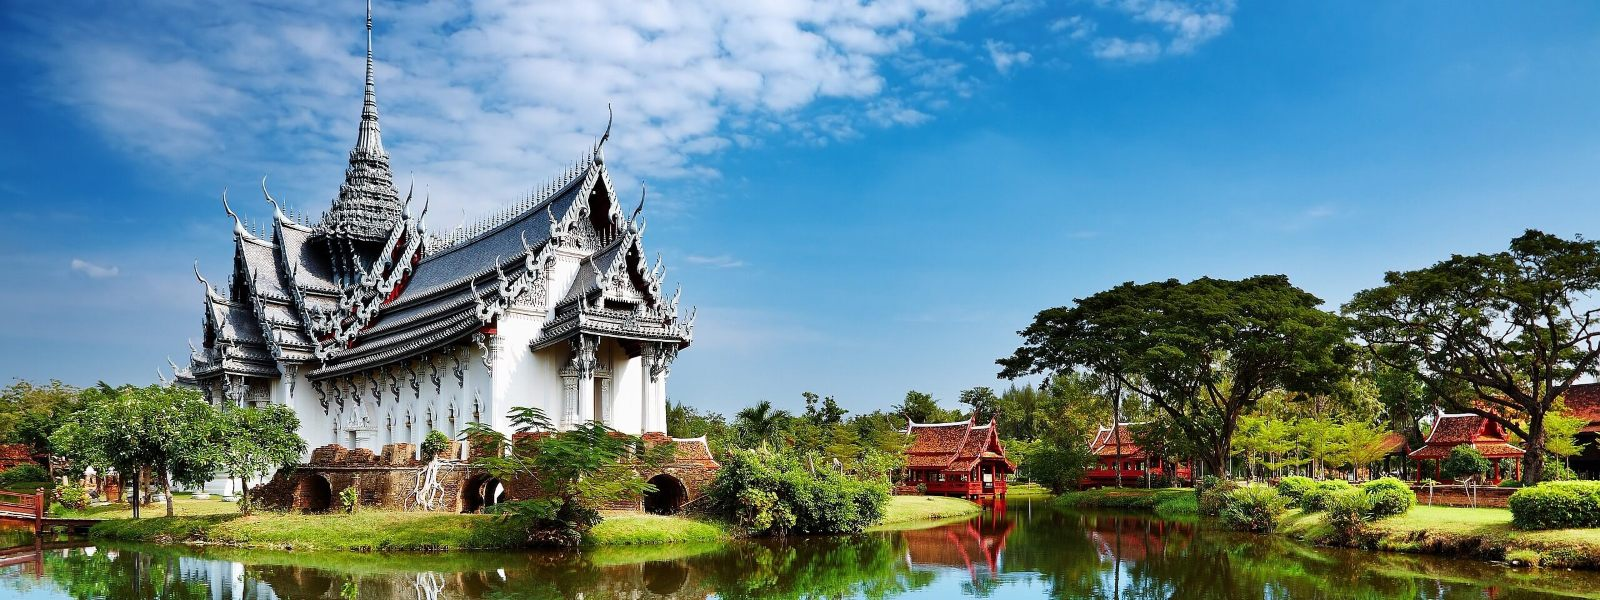 Азиатский замок